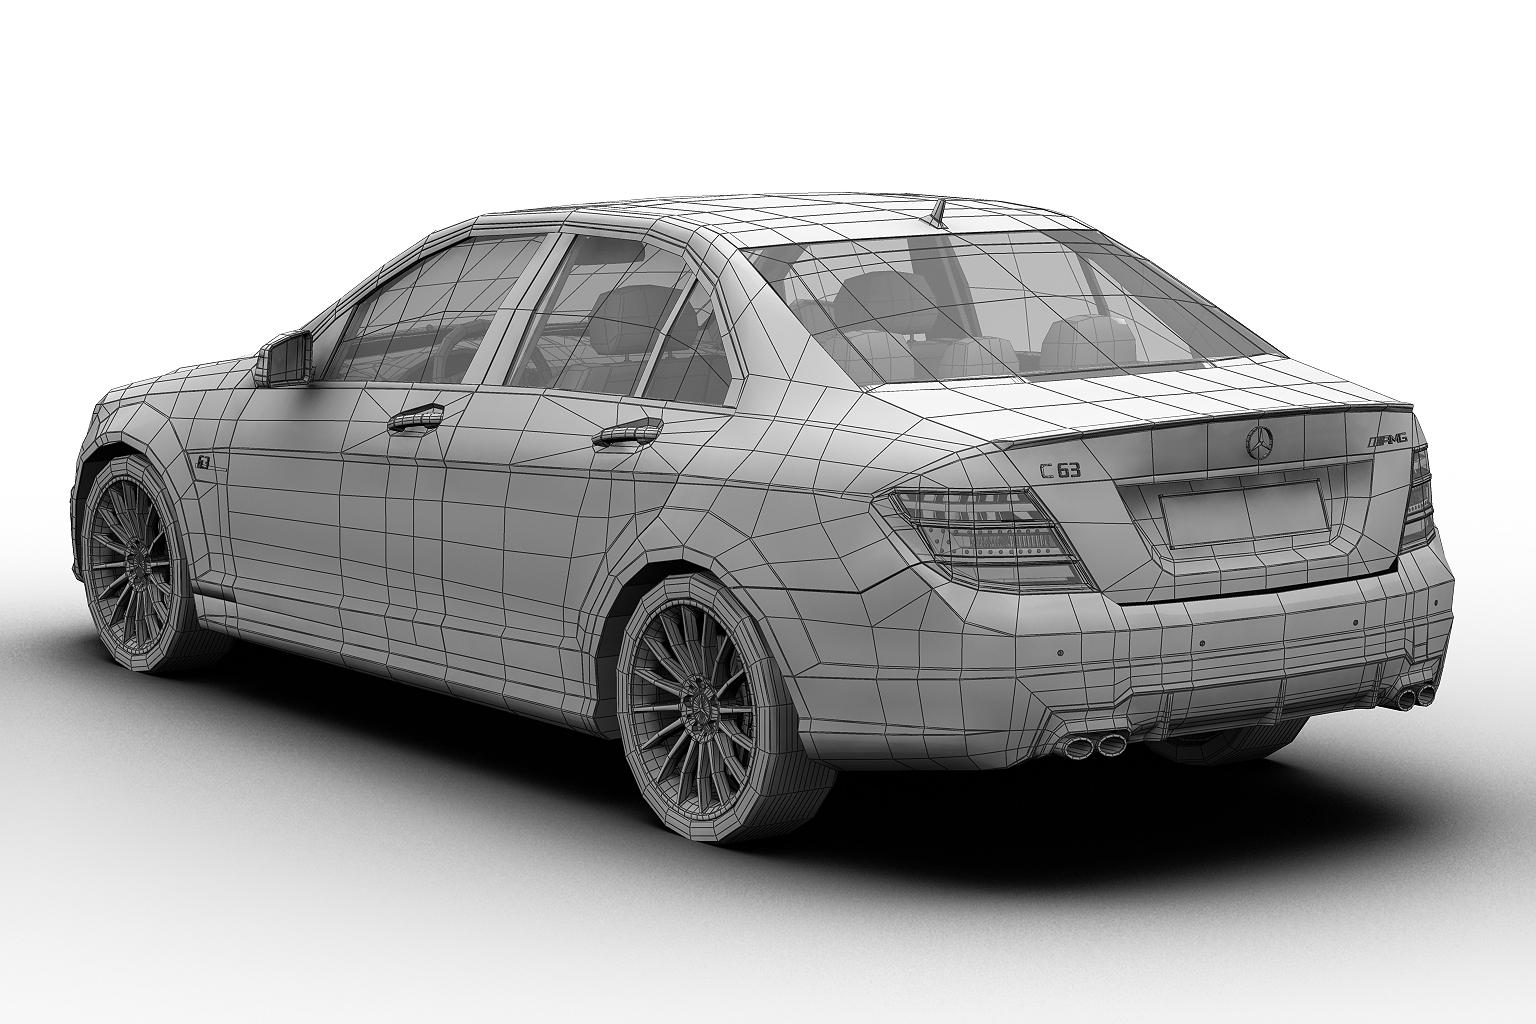 2012 mercedes benz c63 amg 3d modeli 3ds max fbx c4d lwo hrc xsi obj 136257